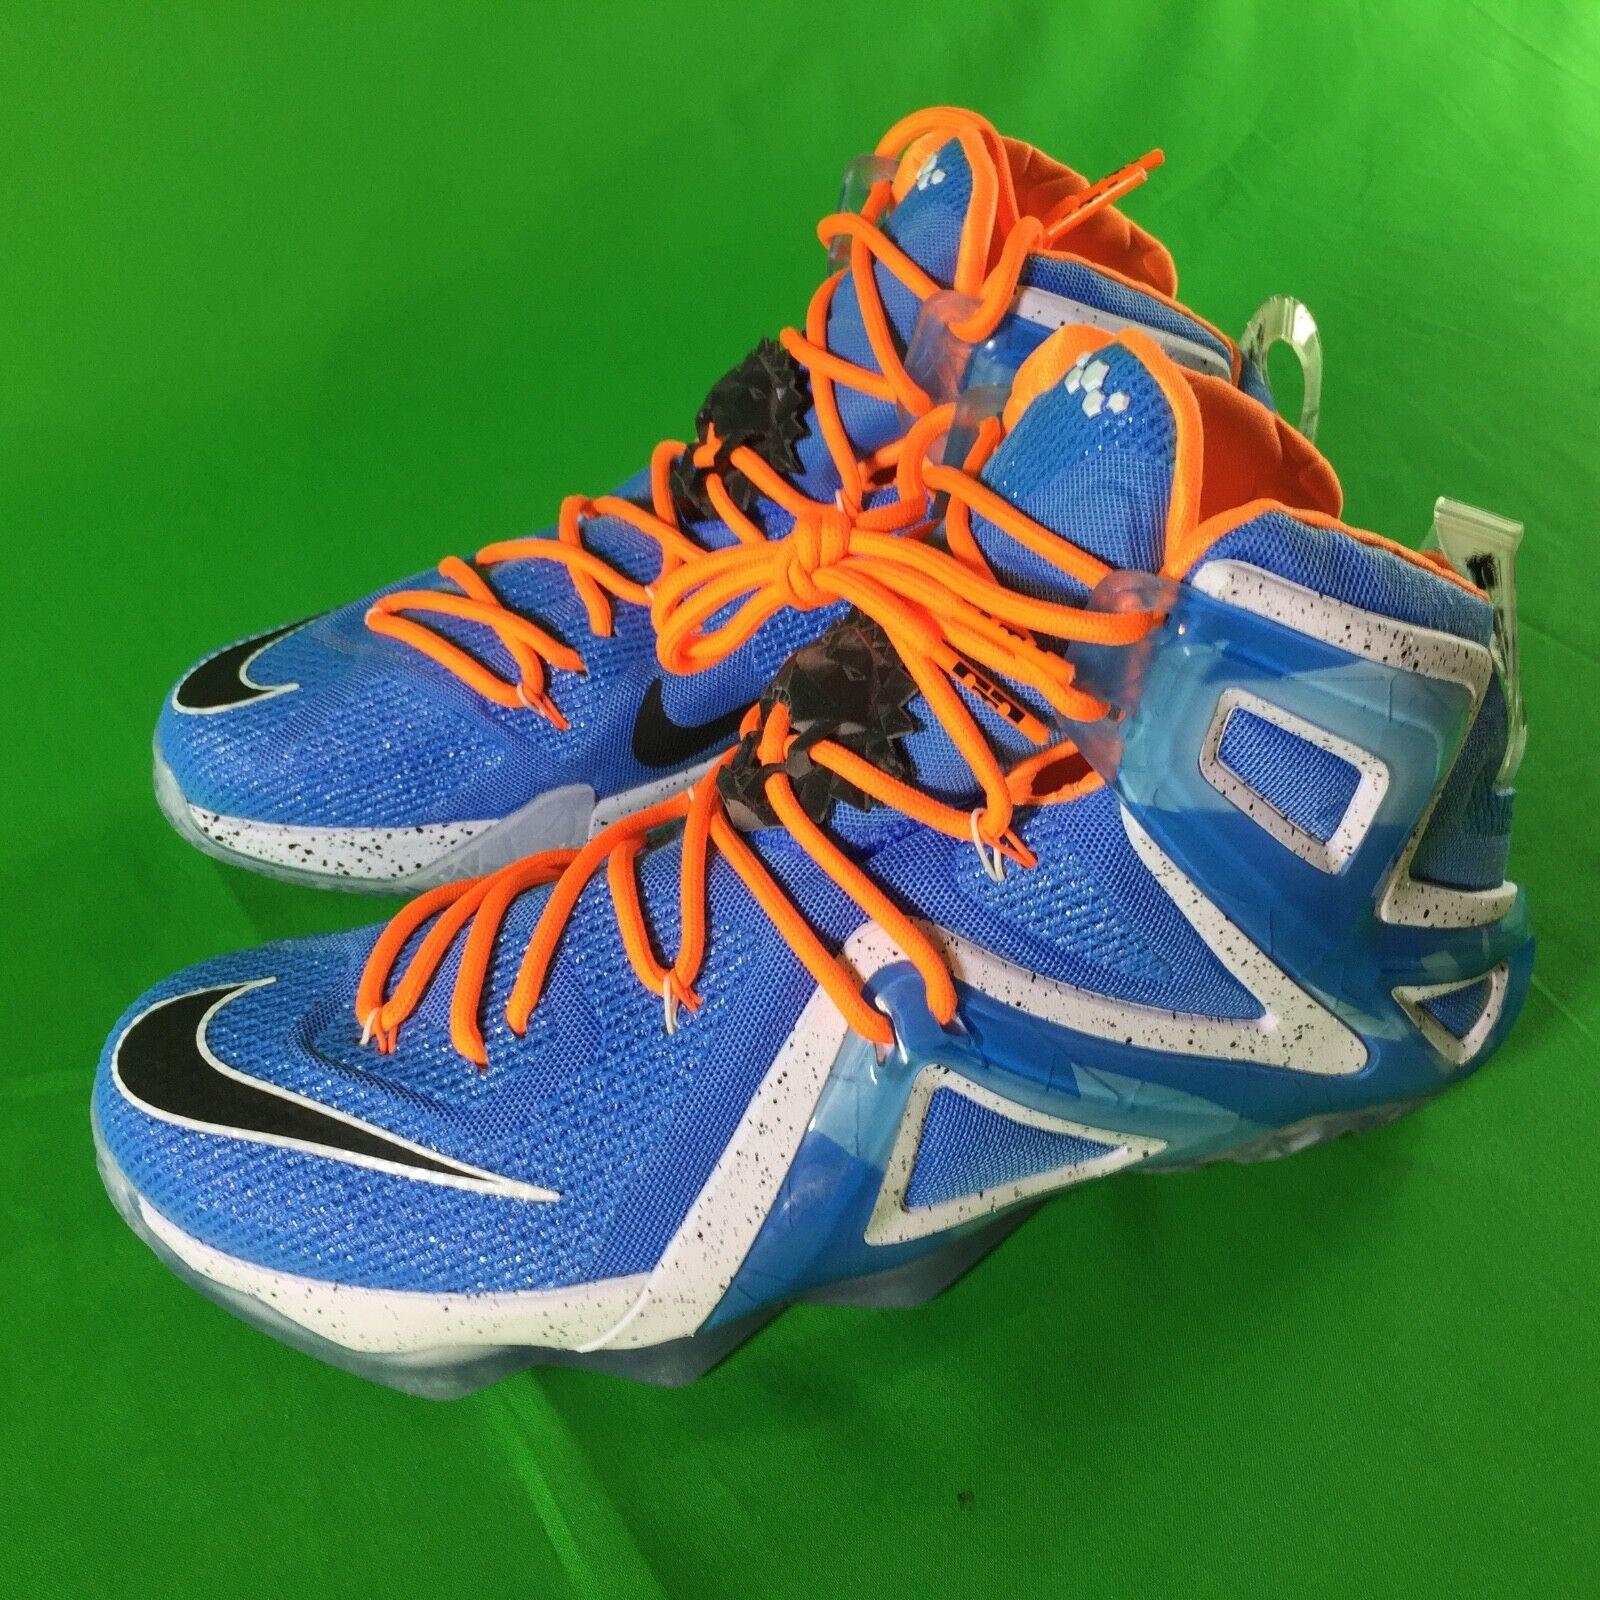 Nike LEBRON JAMES XII Elite Men's Size 11.5 'Elevate' Basketball shoes bluee NEW